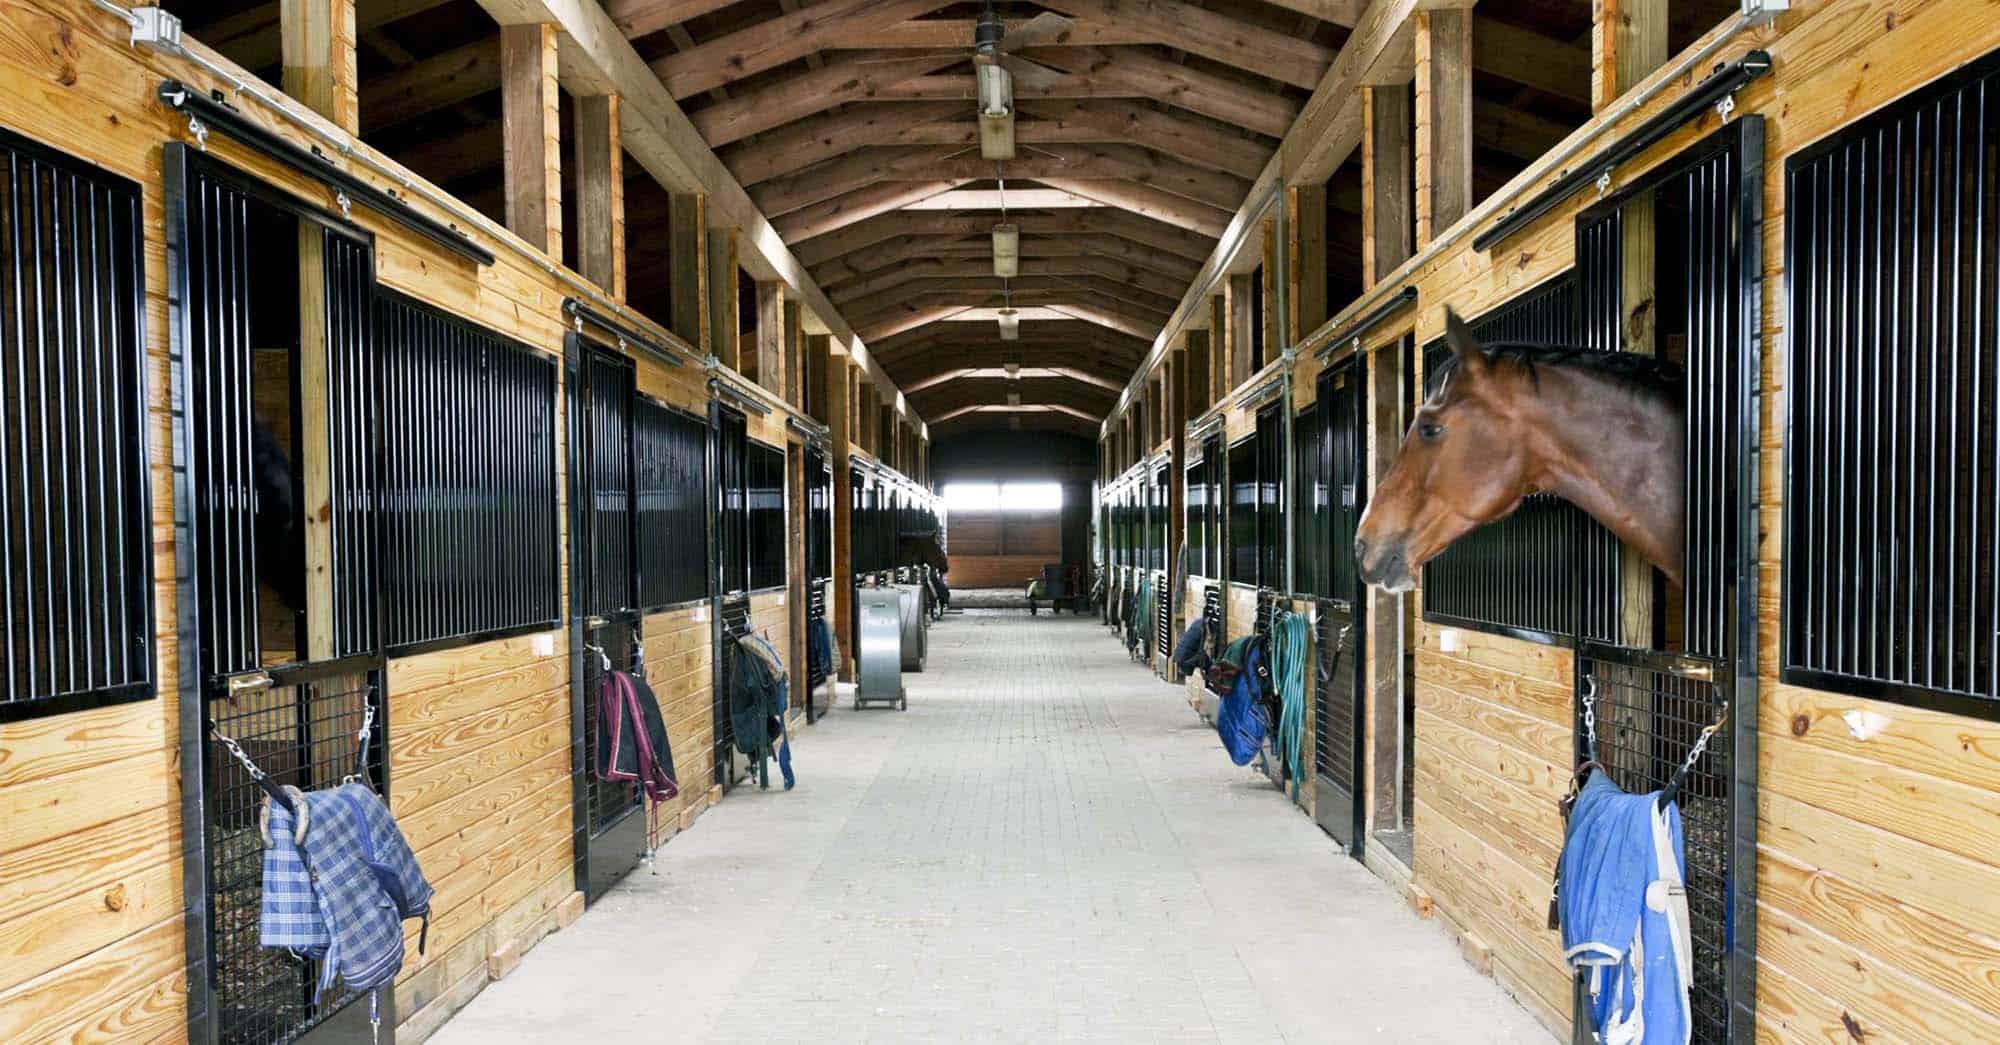 Elaborate horse barn